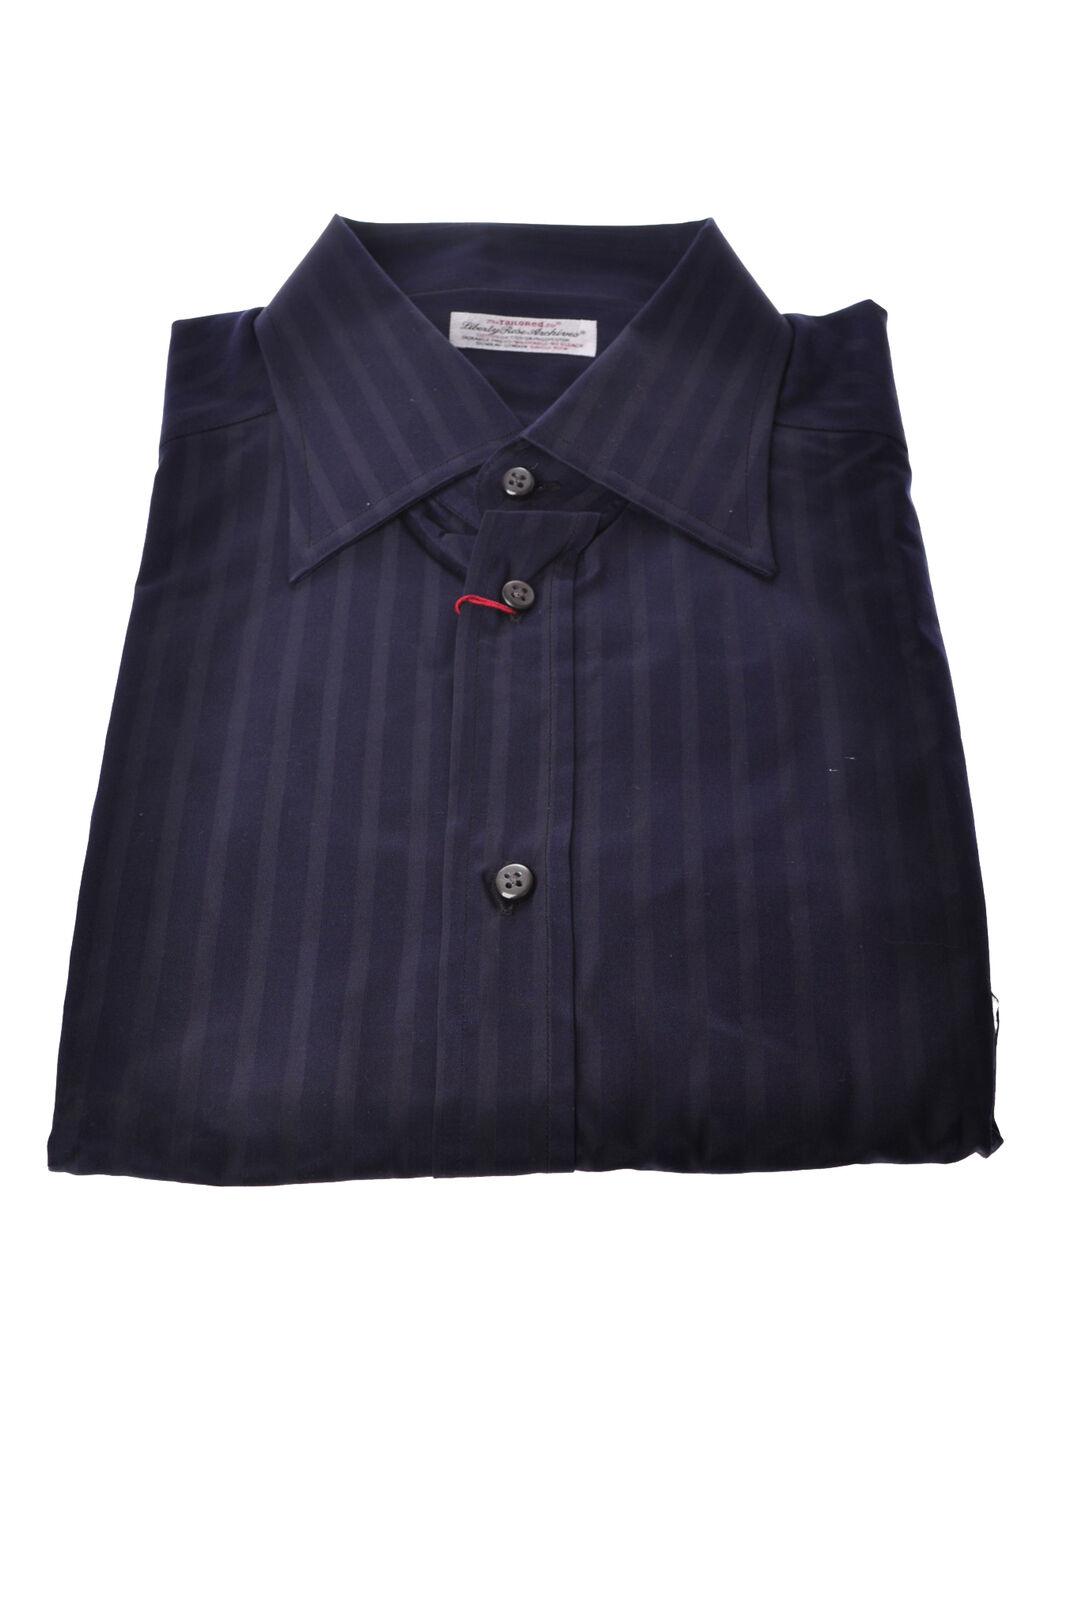 Liberty Rose  -  Shirt - Male - Blau - 3481321A182434